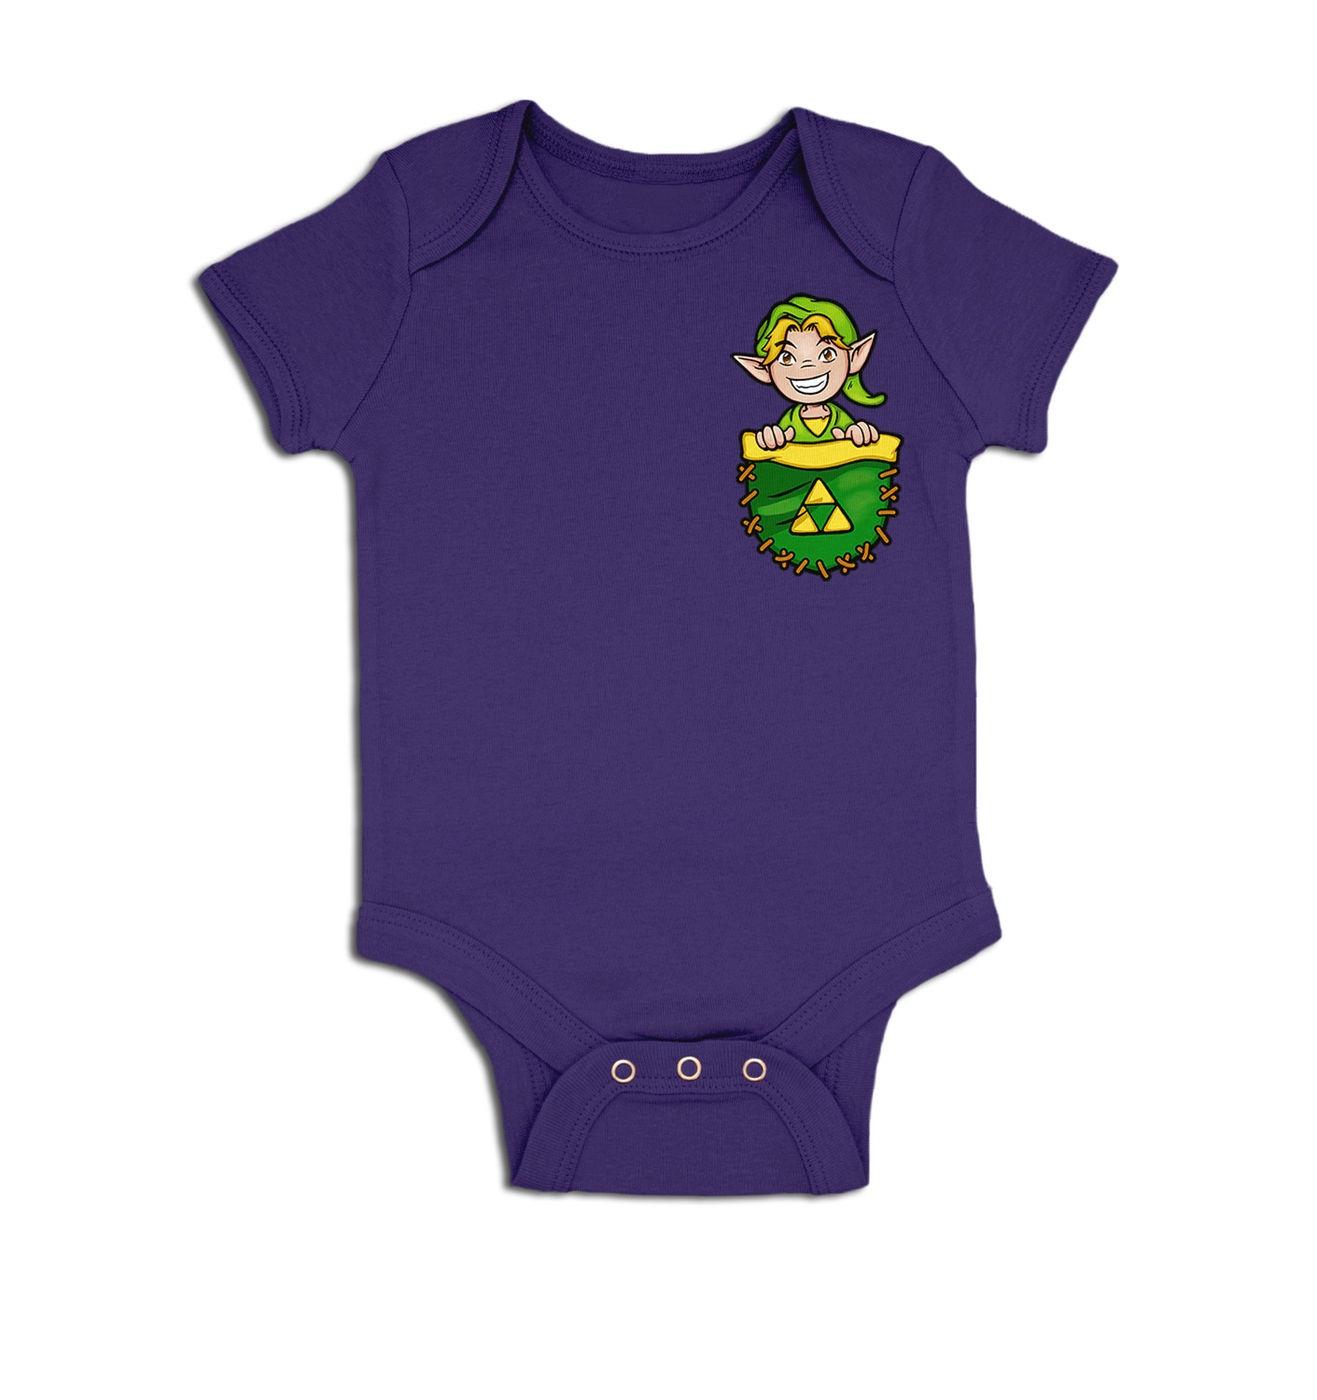 Pocket Hyrule Warrior baby grow by Something Geeky